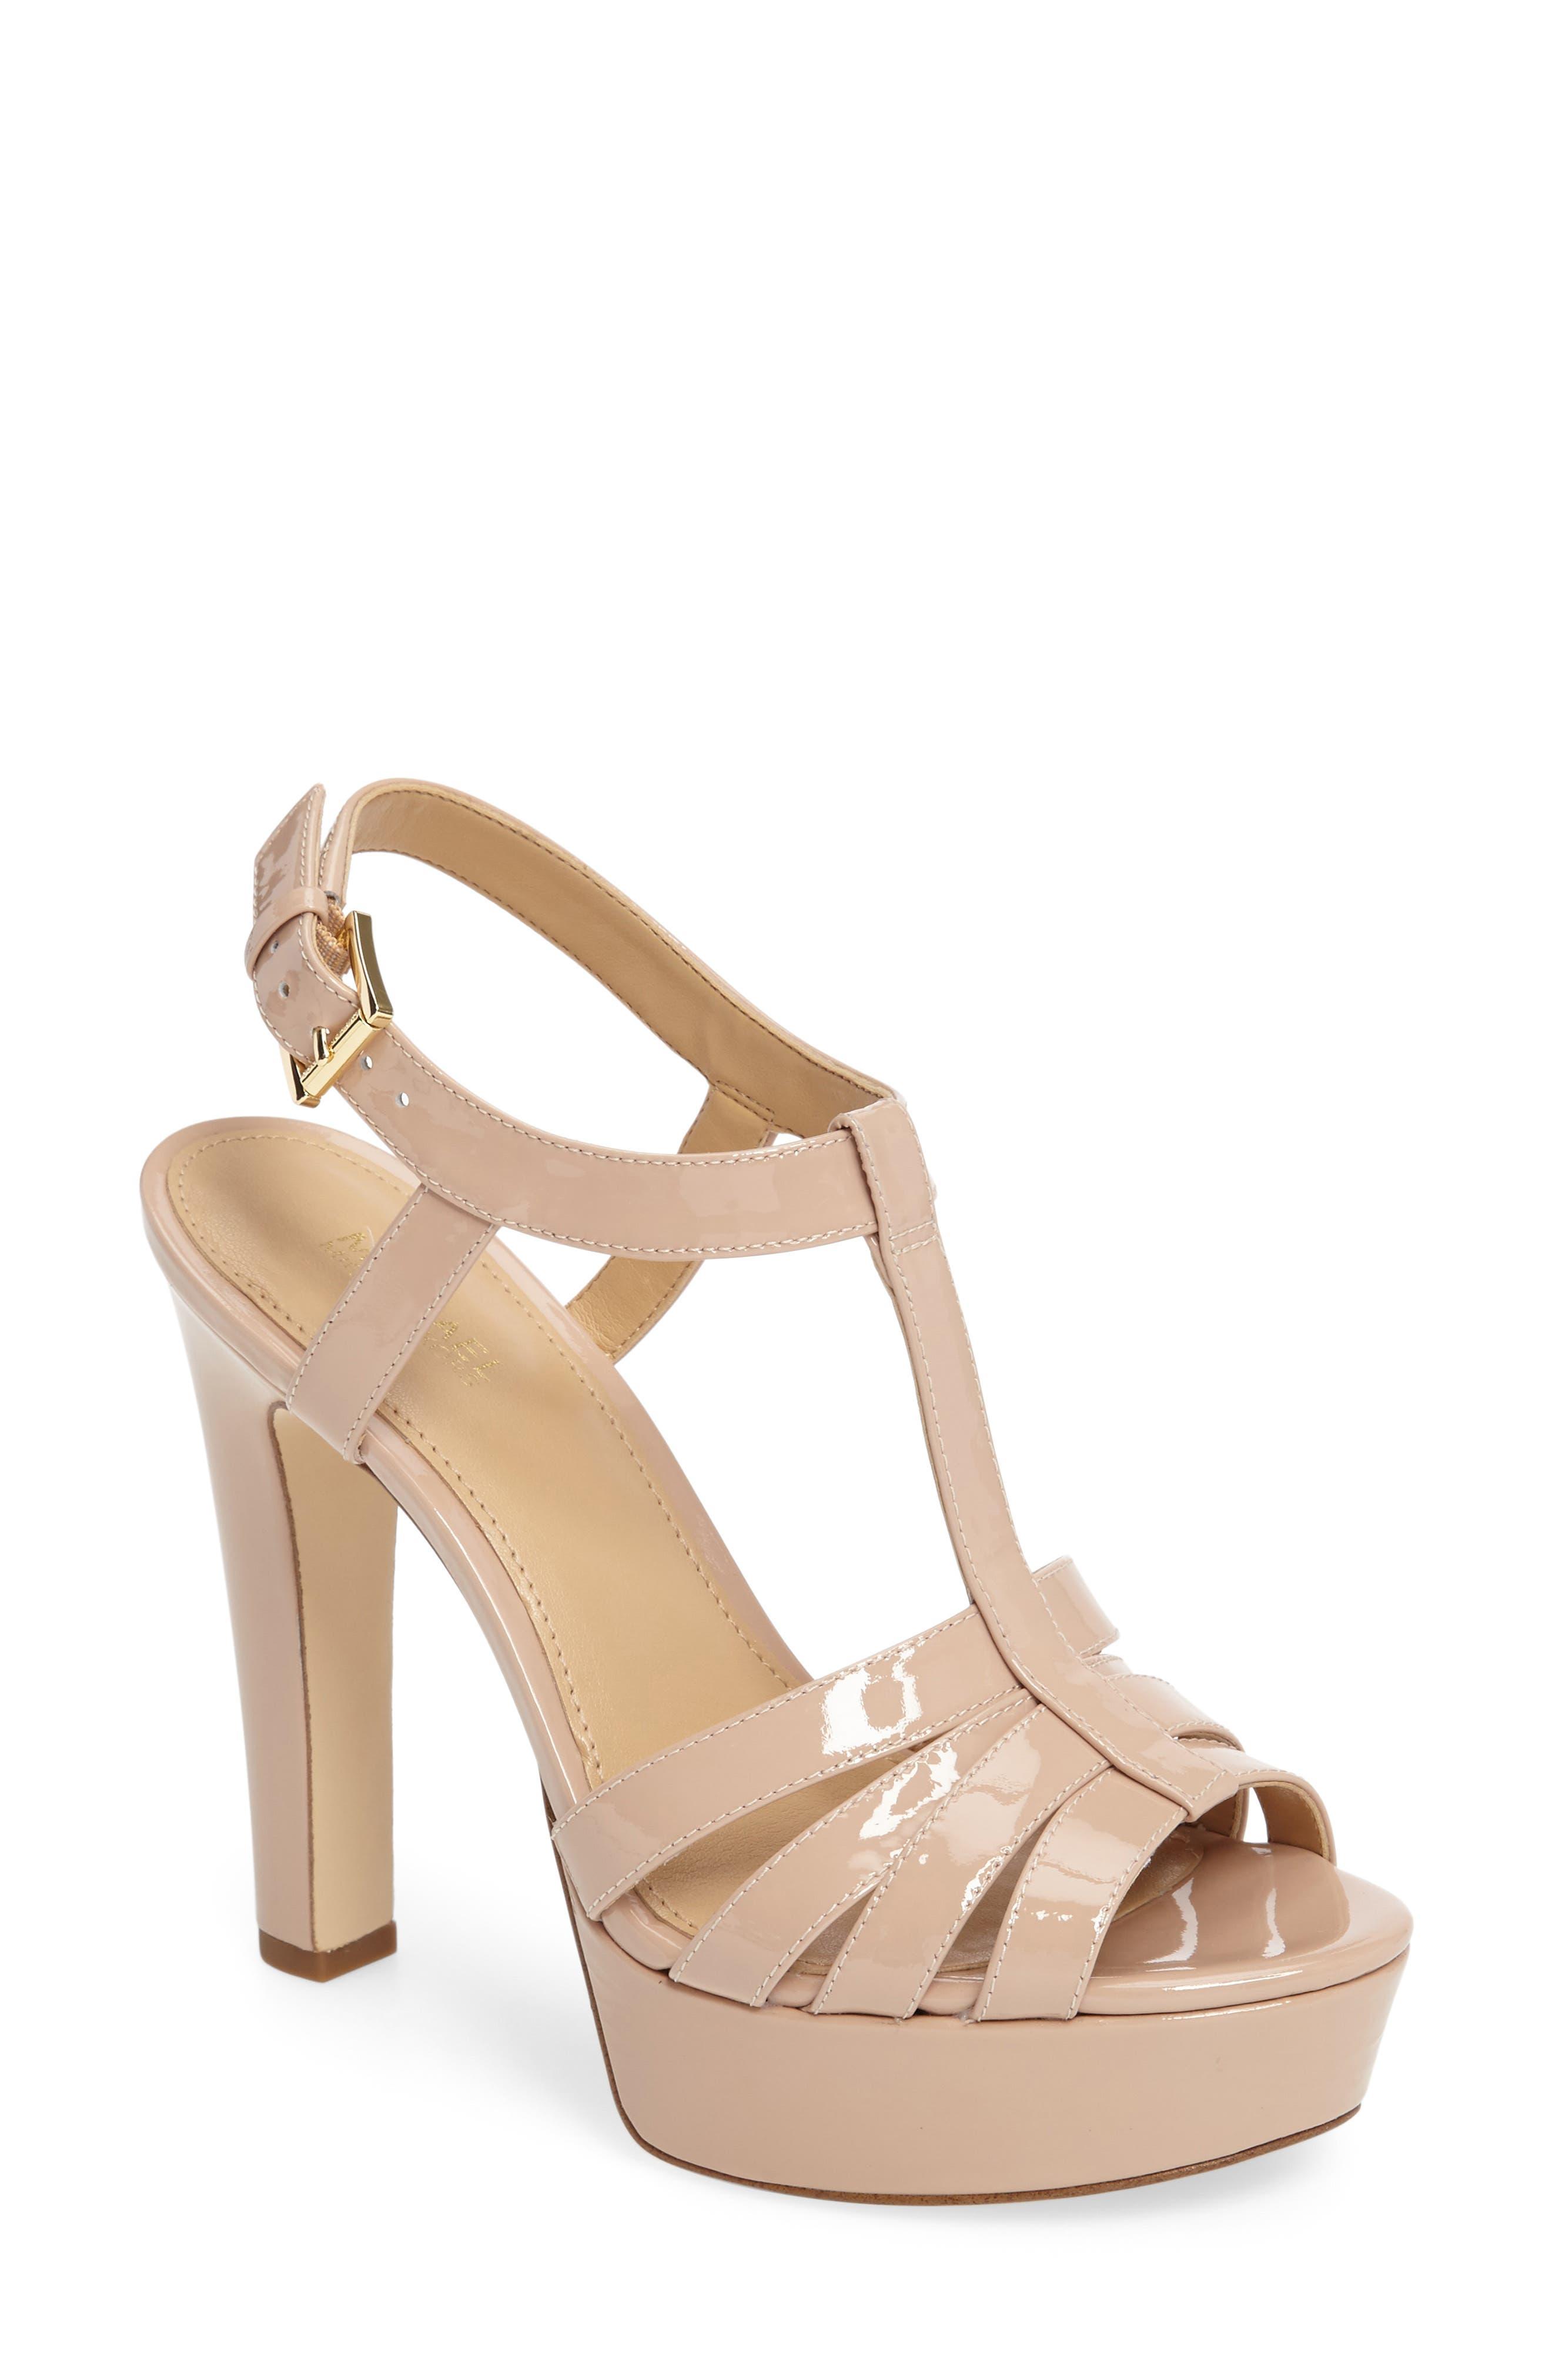 Alternate Image 1 Selected - MICHAEL Michael Kors Catalina Platform Sandal (Women)